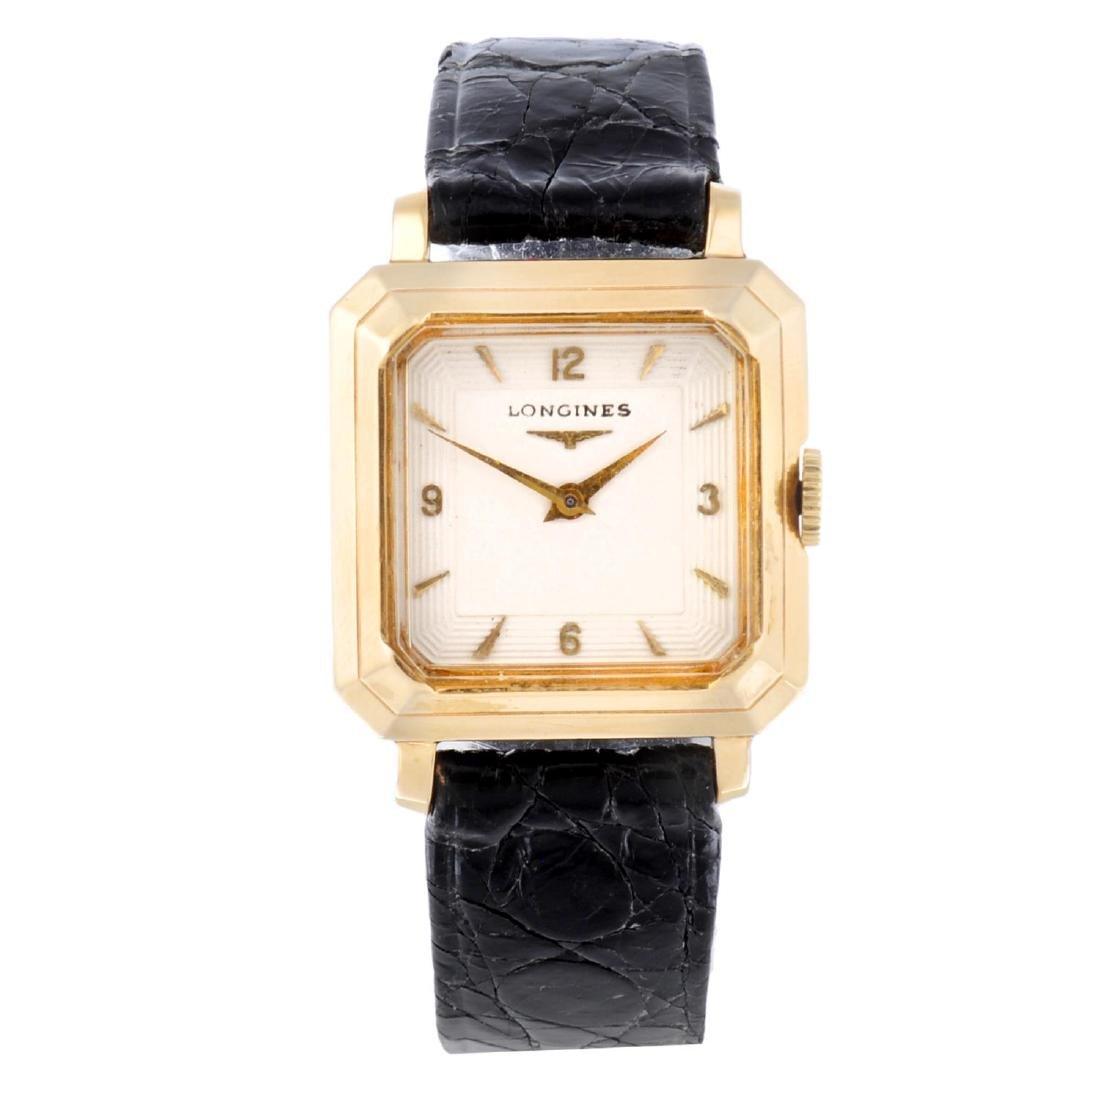 LONGINES - a gentleman's wrist watch. Yellow metal